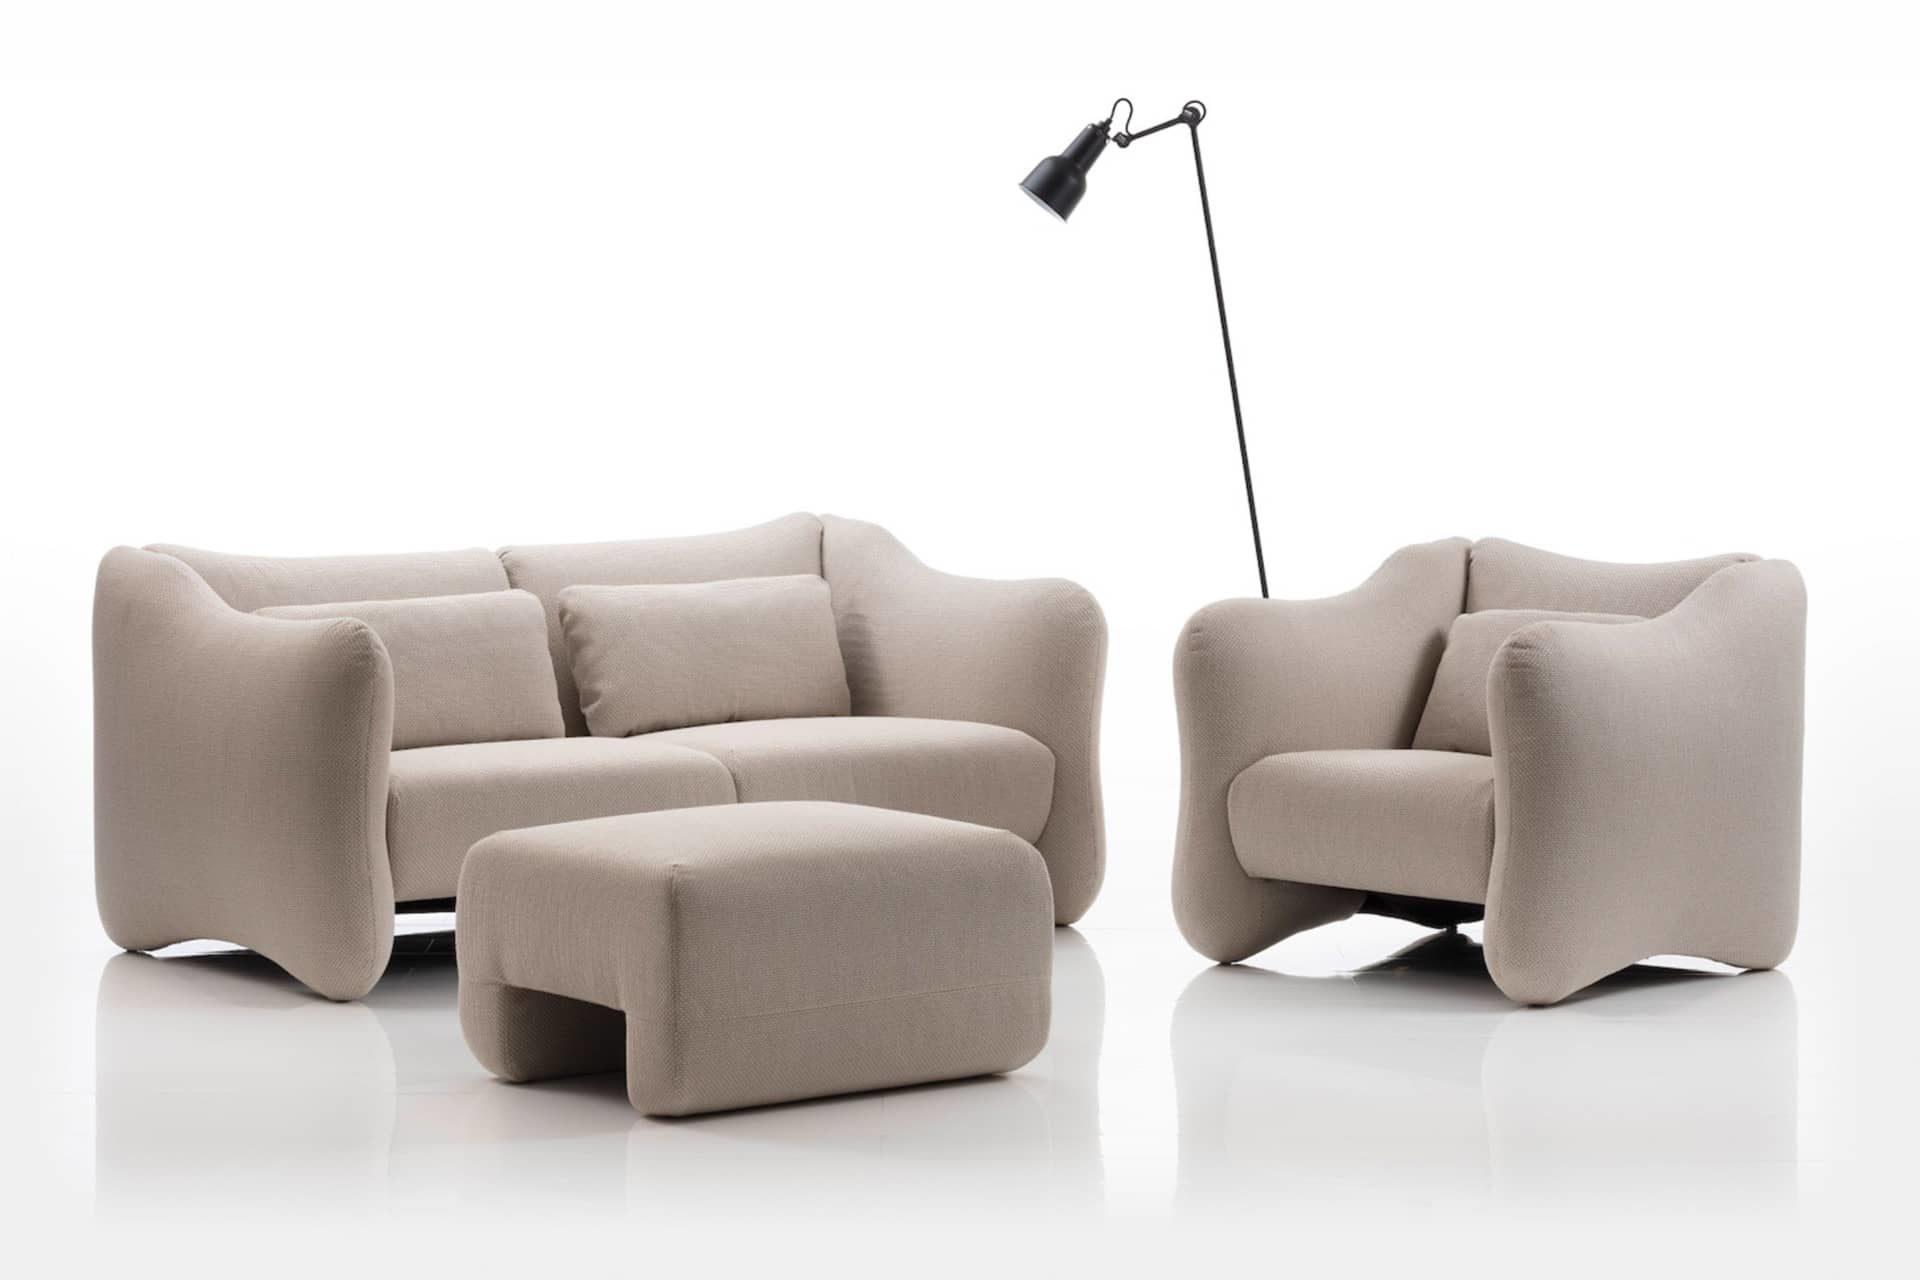 brühl Funktionssofas Eckgruppen Sessel Relax Design bongo bay